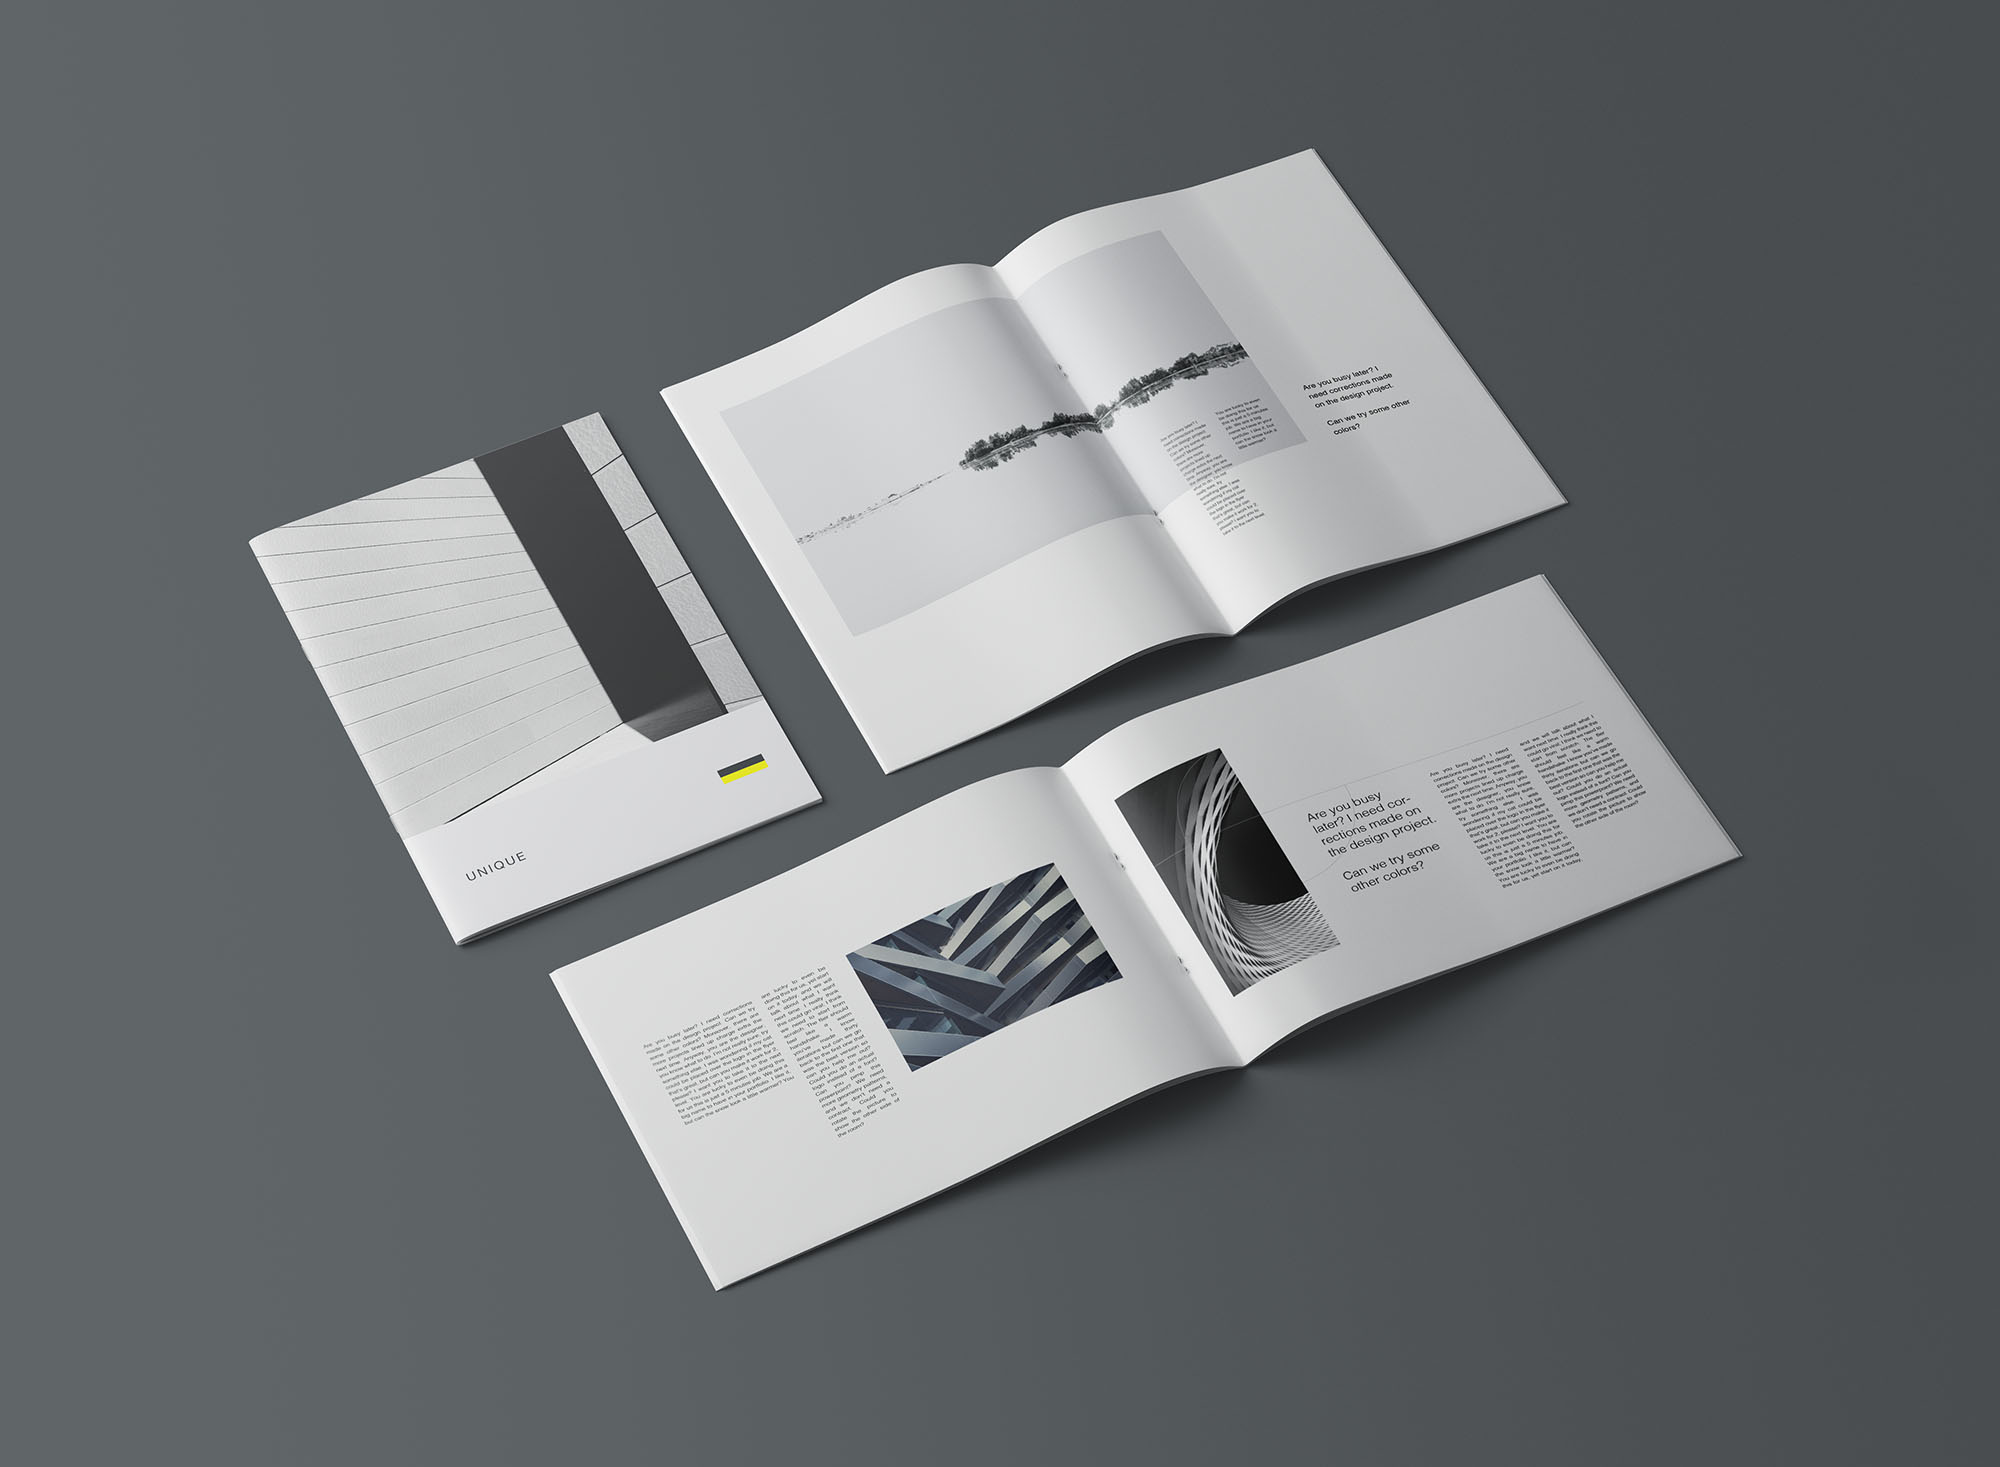 A4 Portrait & Landscape Brochure Mockup 4